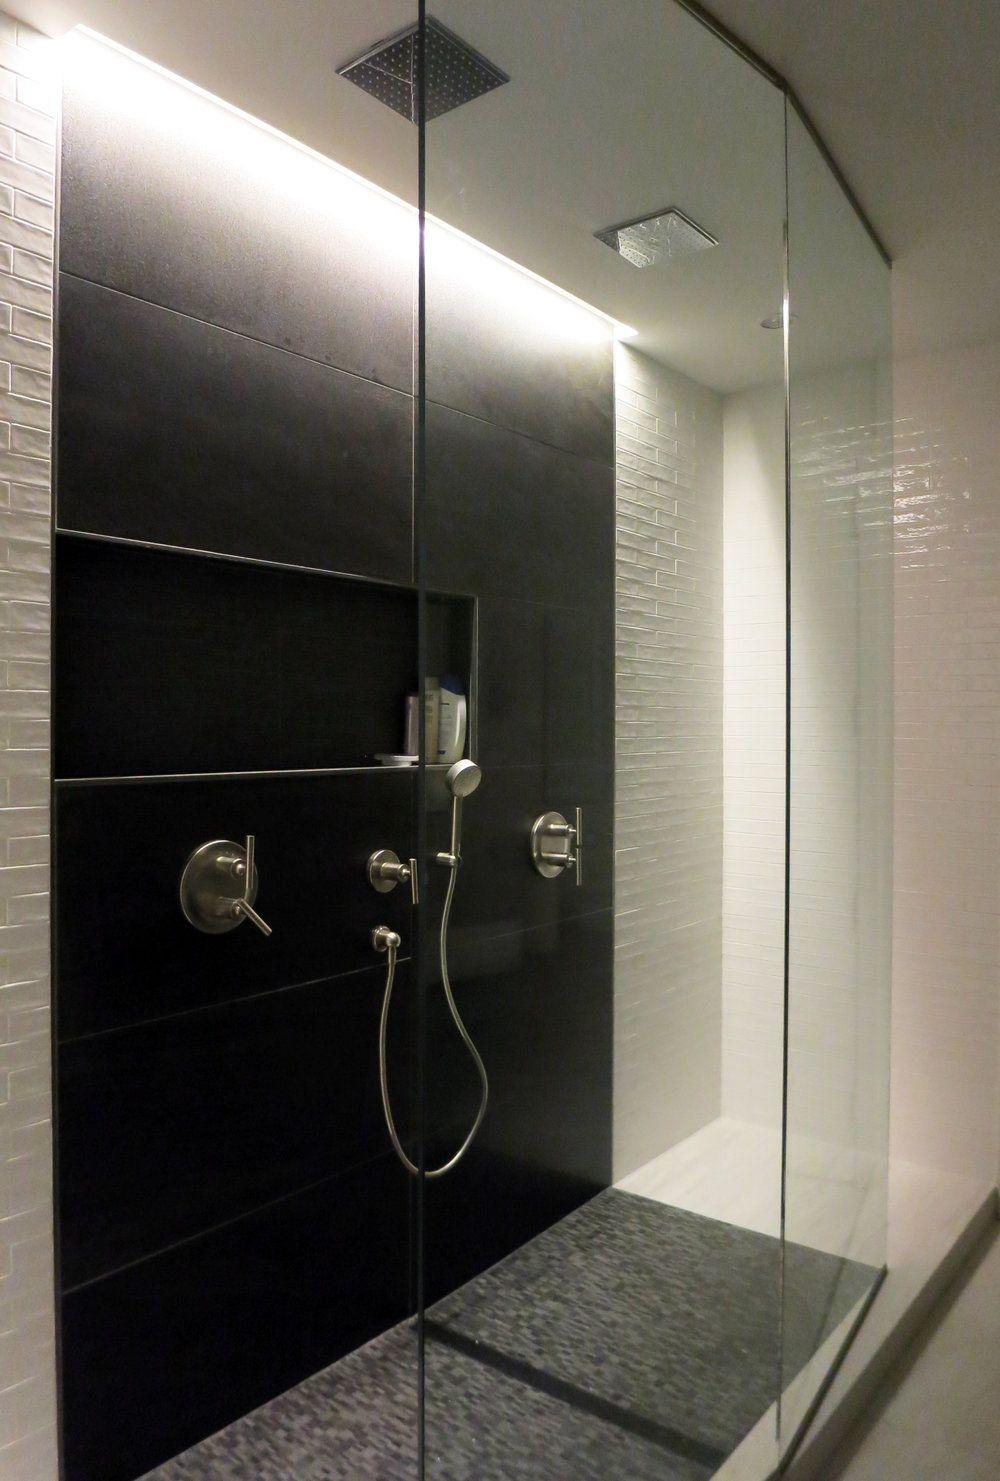 Bathroom Renovation EDGE Design Spacious Double Shower Custom Angular Glass Enclosure Cove Lighting